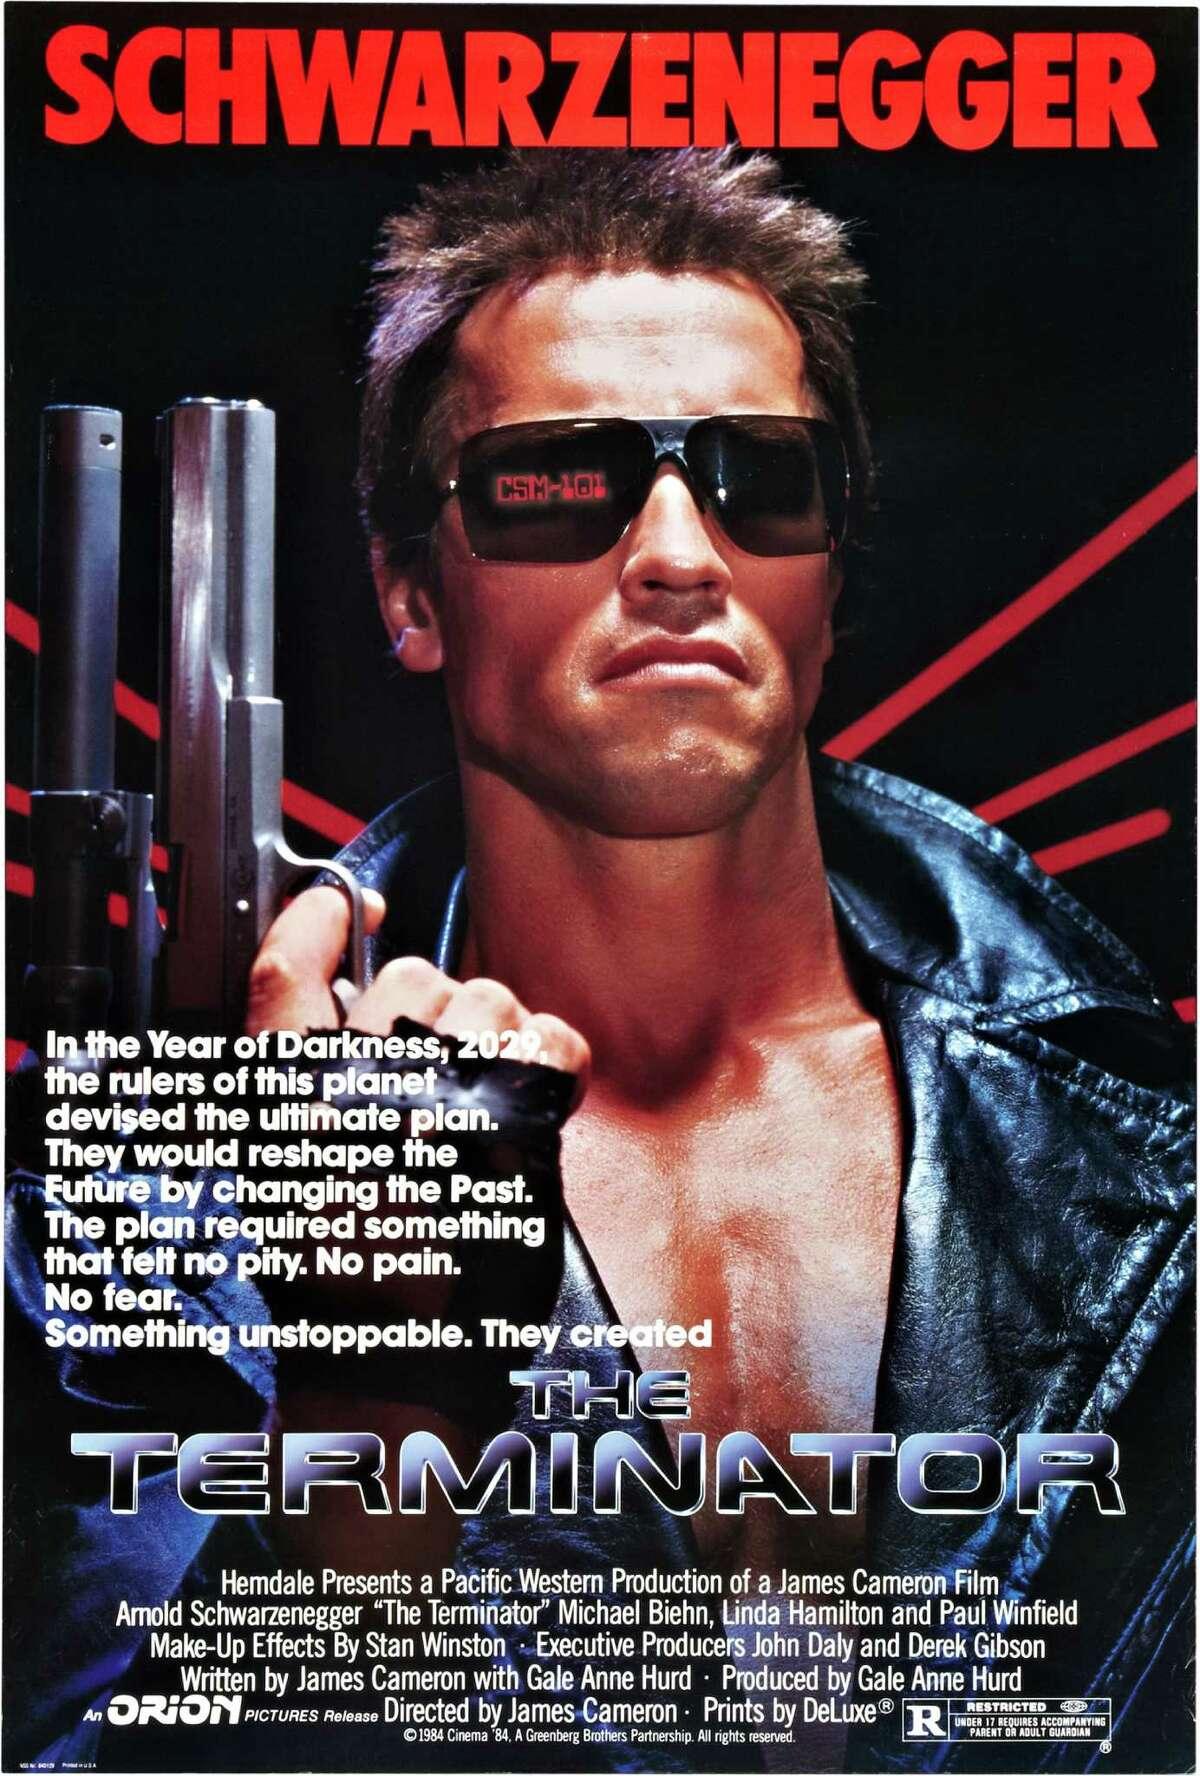 Earlier this week, Arnold Schwarzenegger told website The Arnold Fans that